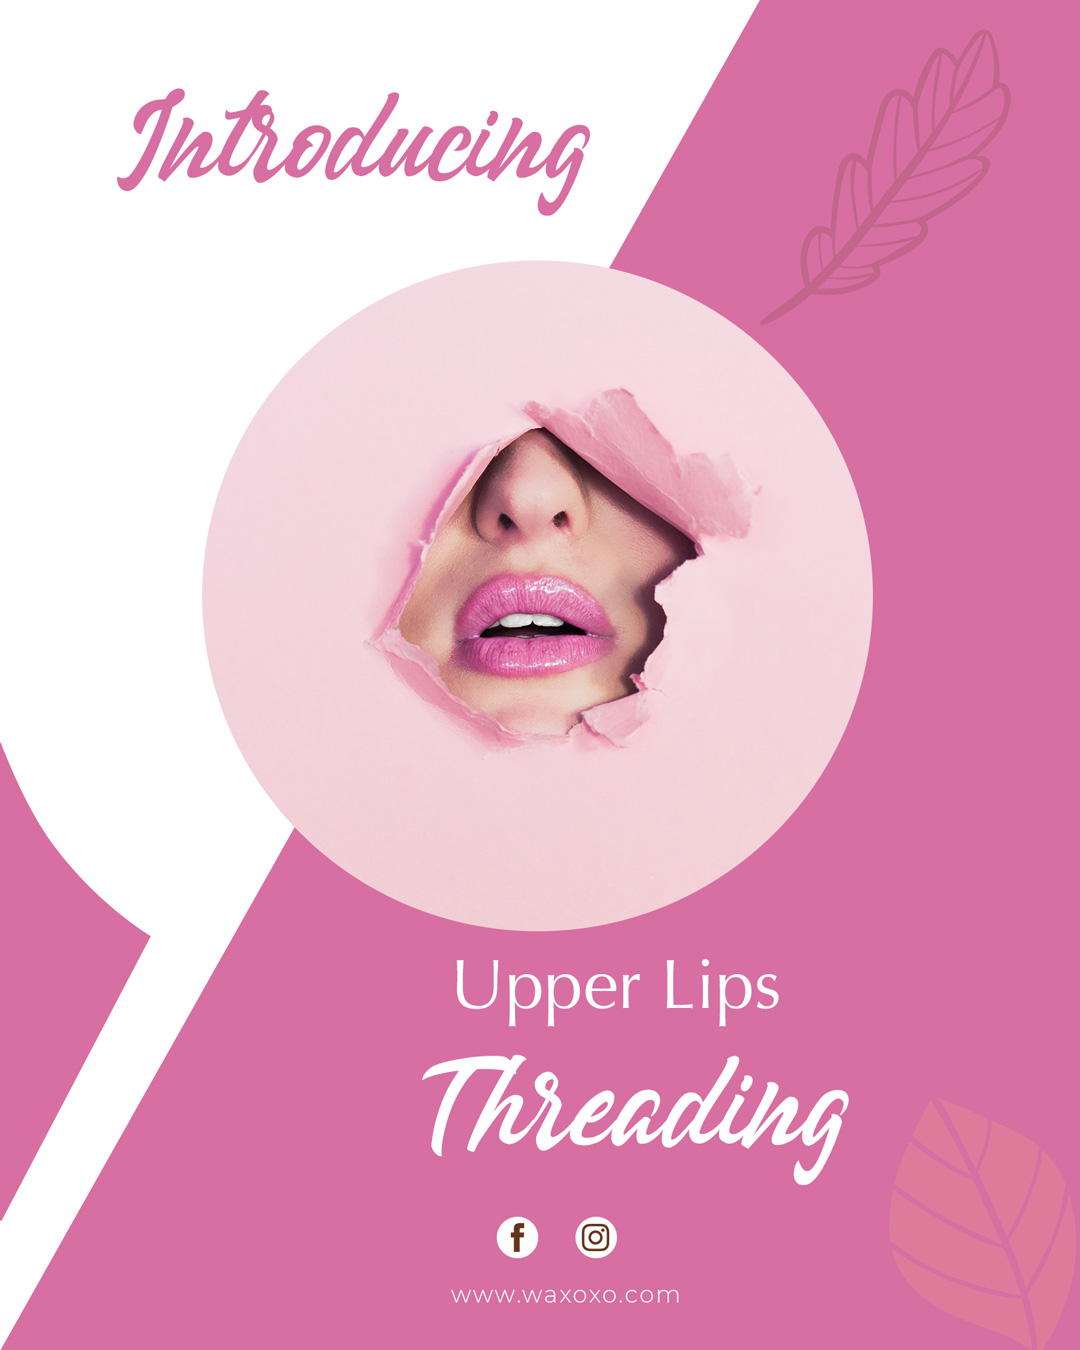 uper lips threading at waxoxo sugaring waxbar